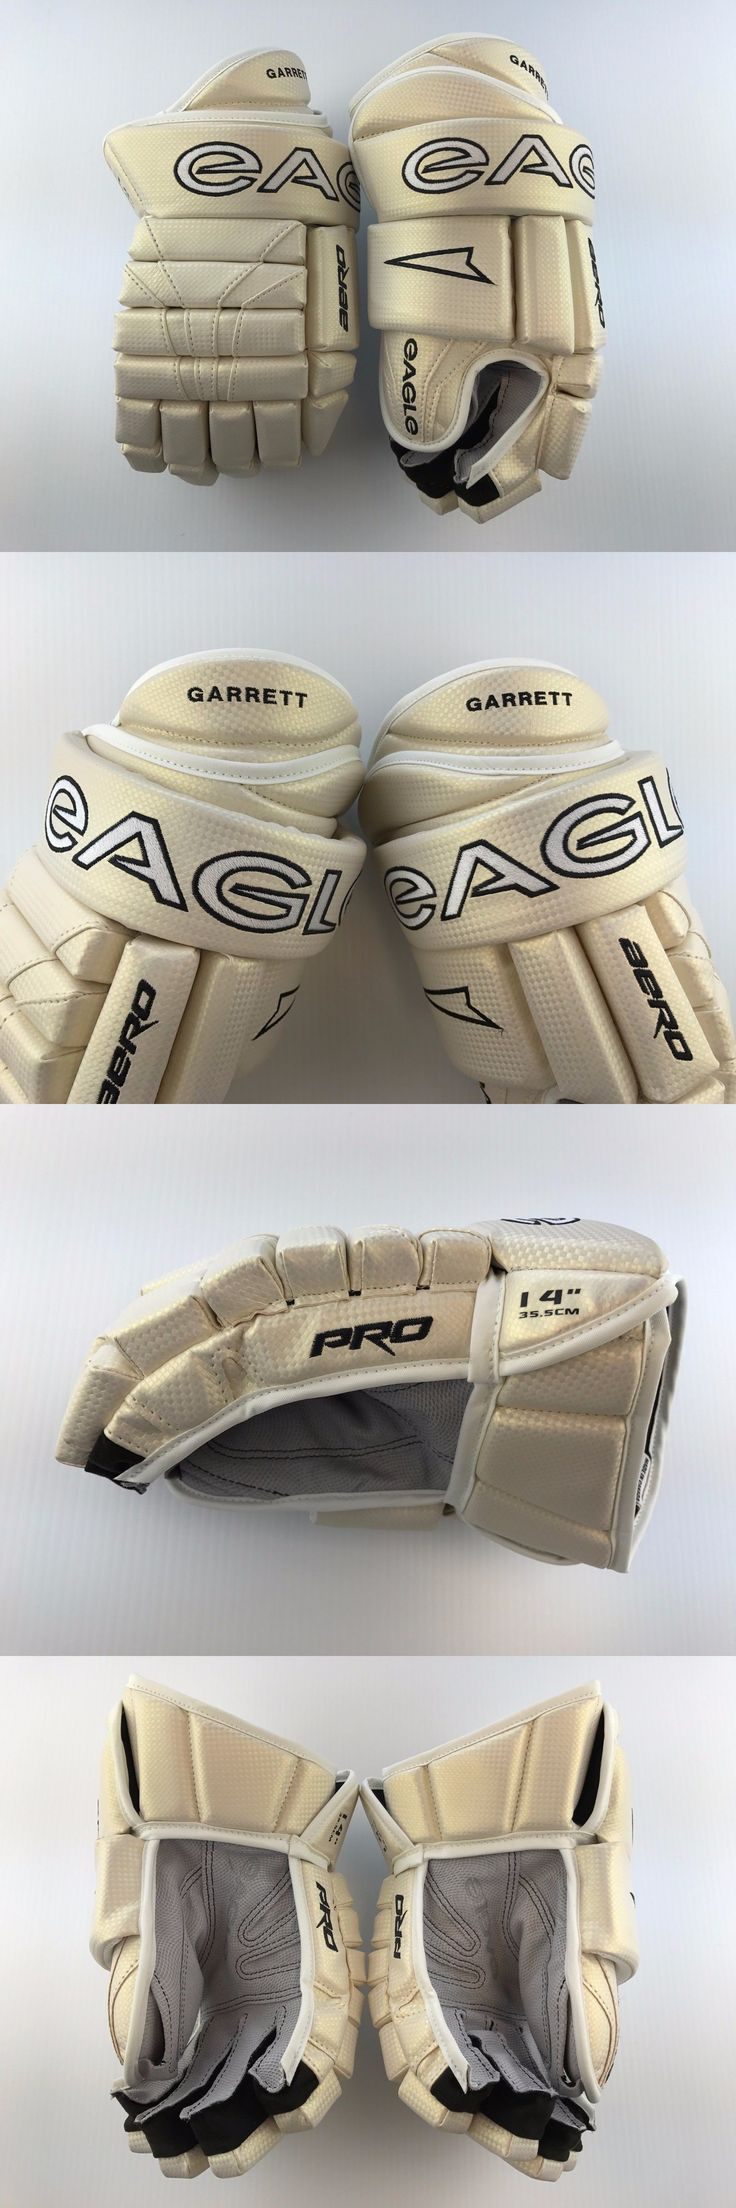 Gloves 20853: New! Custom Full Carbon Eagle Aero Pro Hockey Player Gloves 14 Cream Flex Cuff! -> BUY IT NOW ONLY: $109 on eBay!